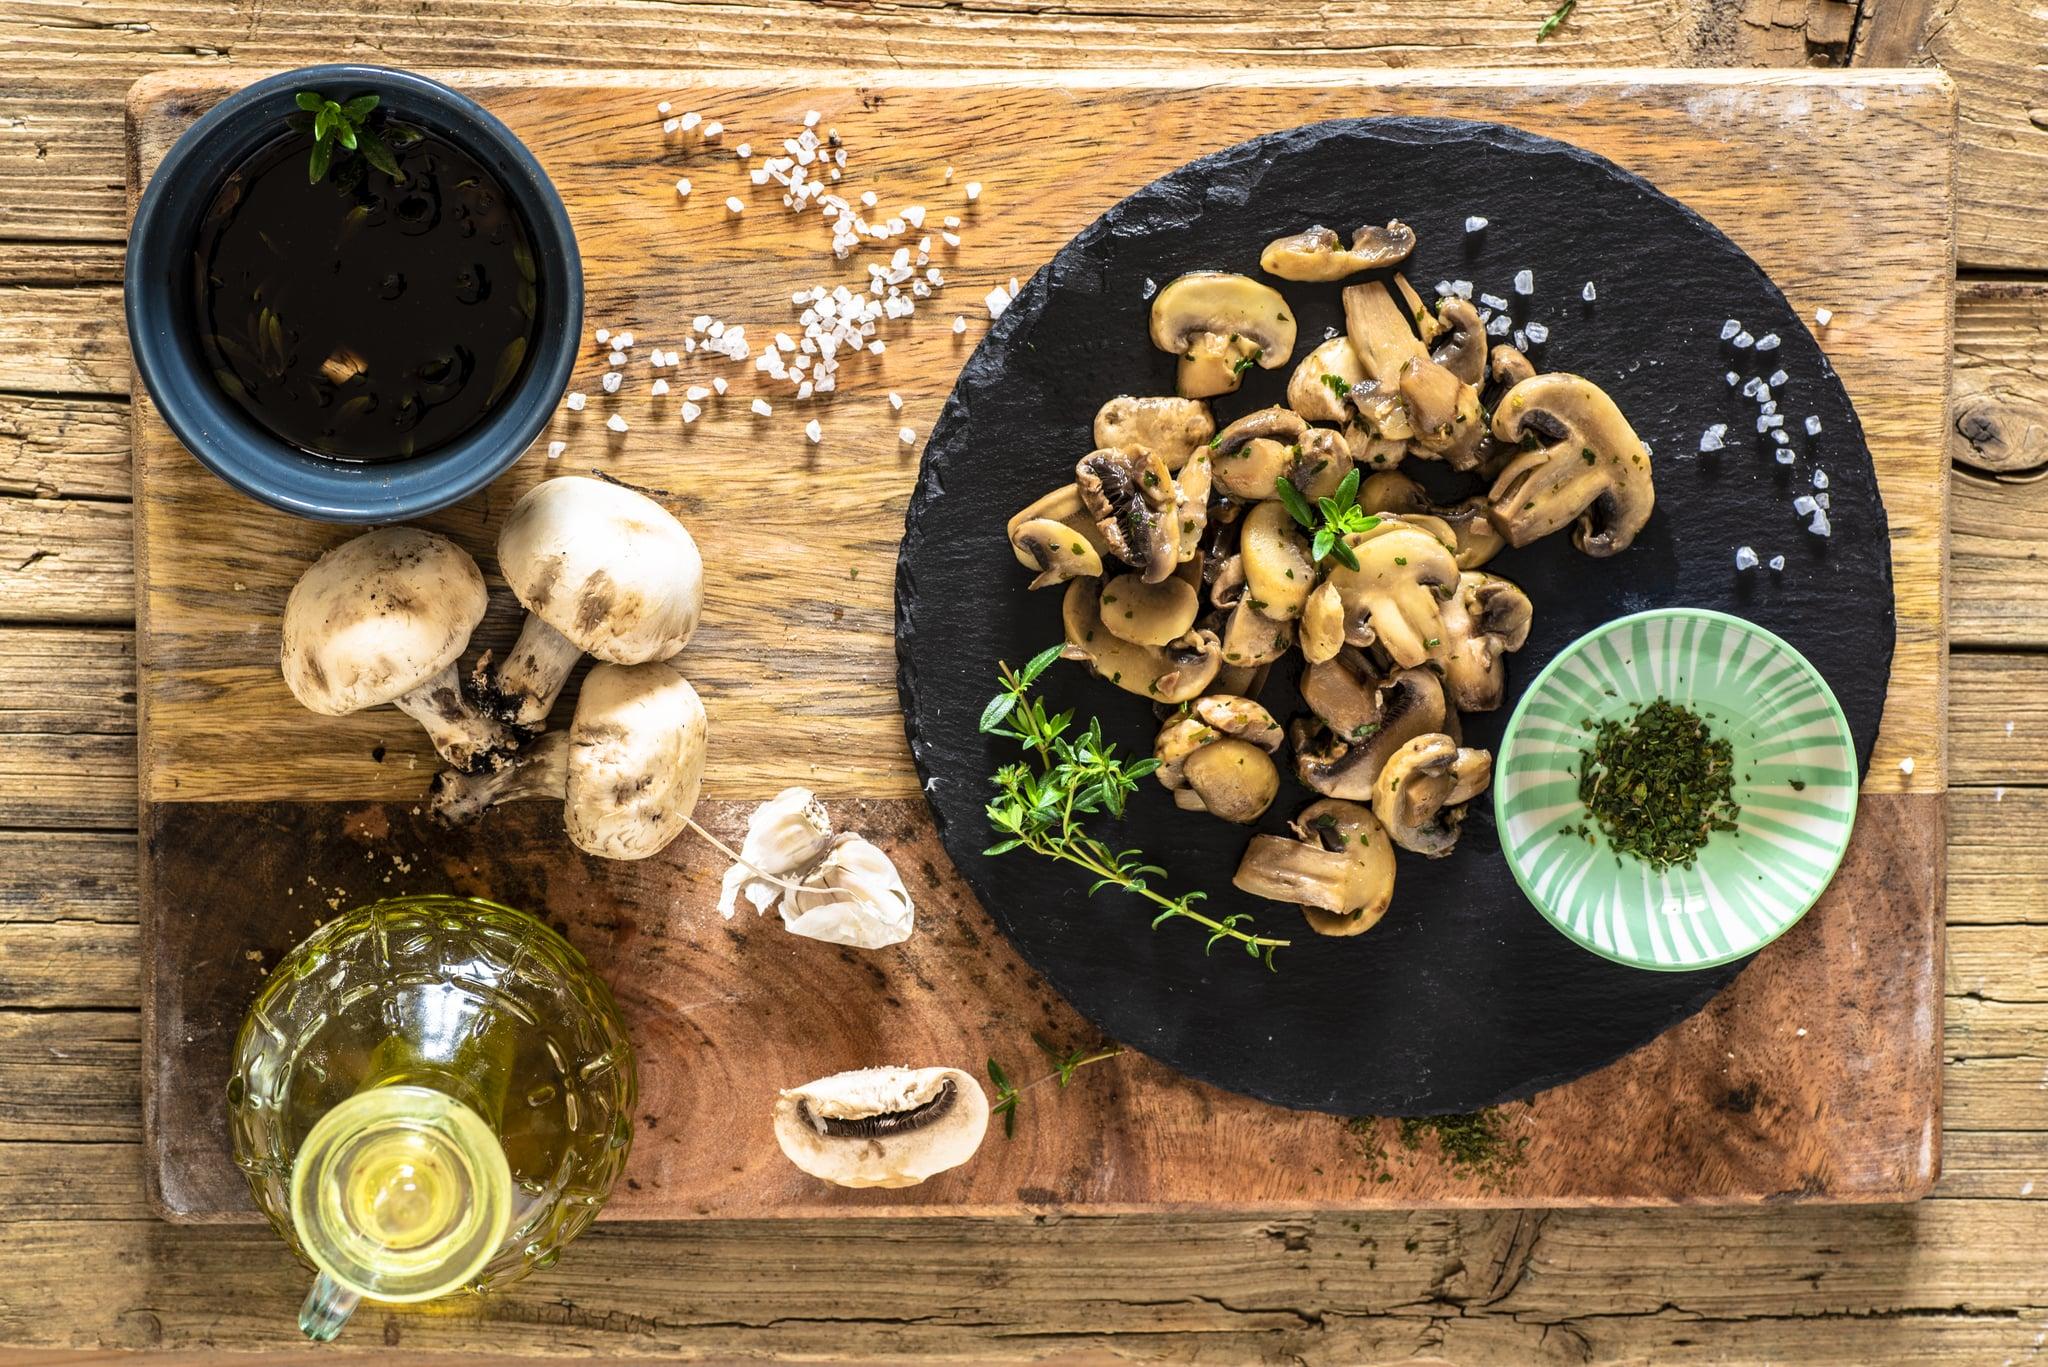 sautéed mushrooms a pan with parsley and garlic, sautéed, typical Italian dish